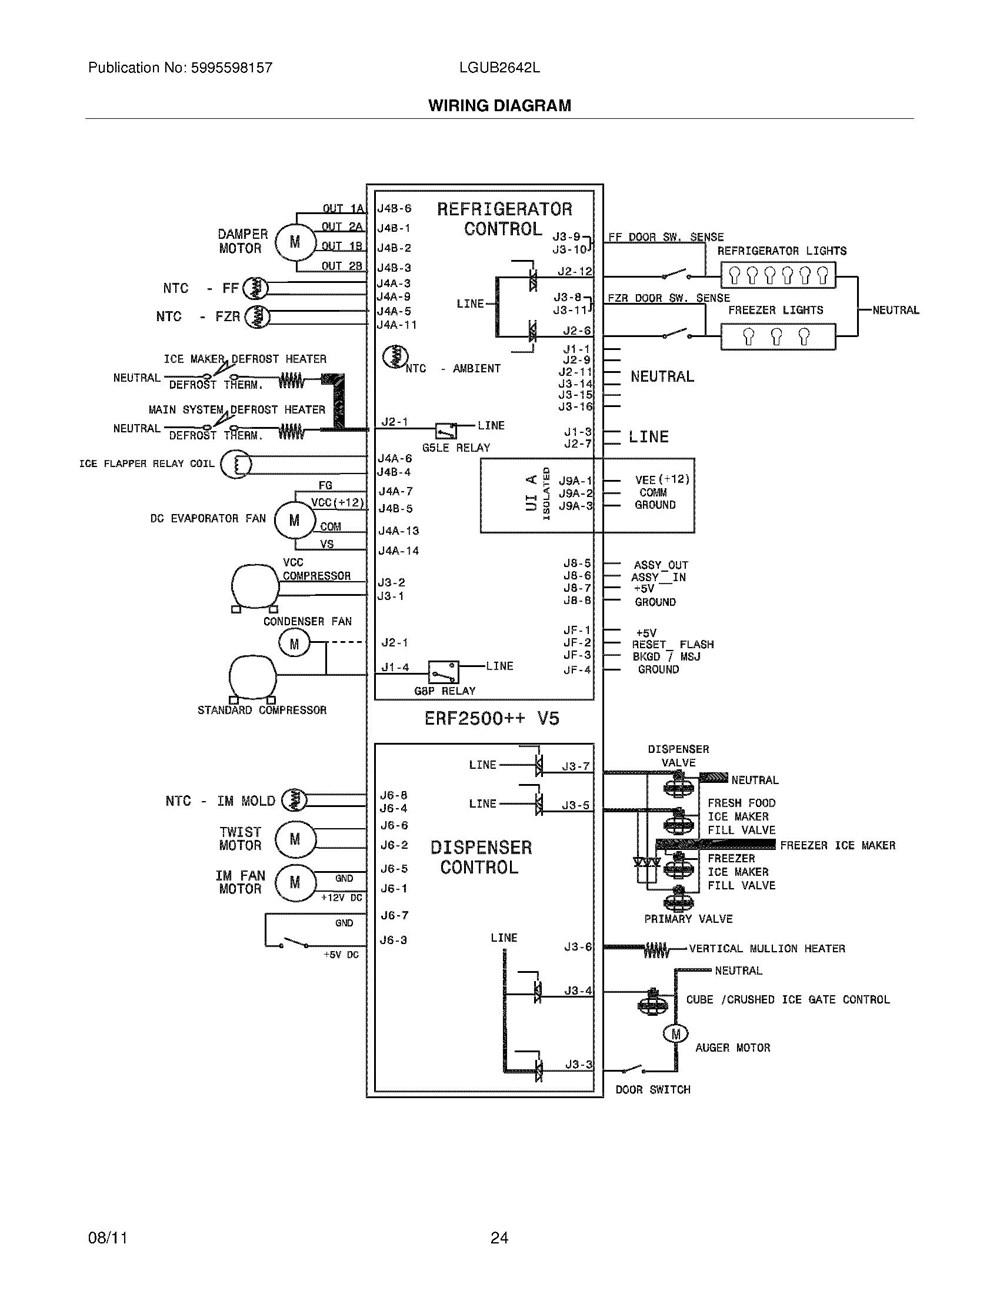 frigidaire refrigerator repair manual pdf